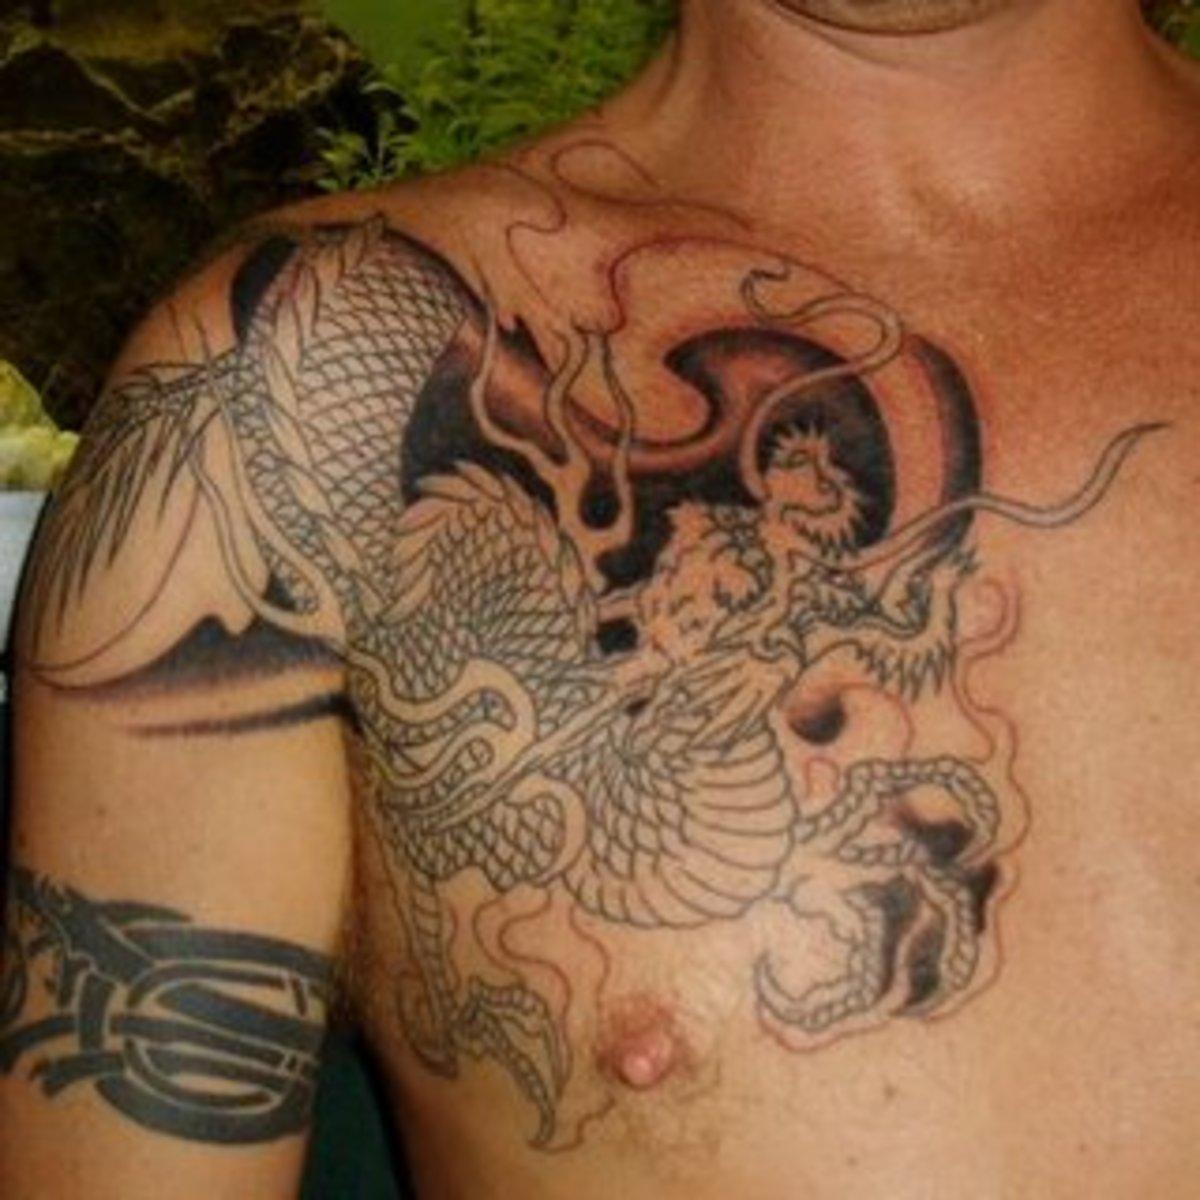 Half sleeve dragon